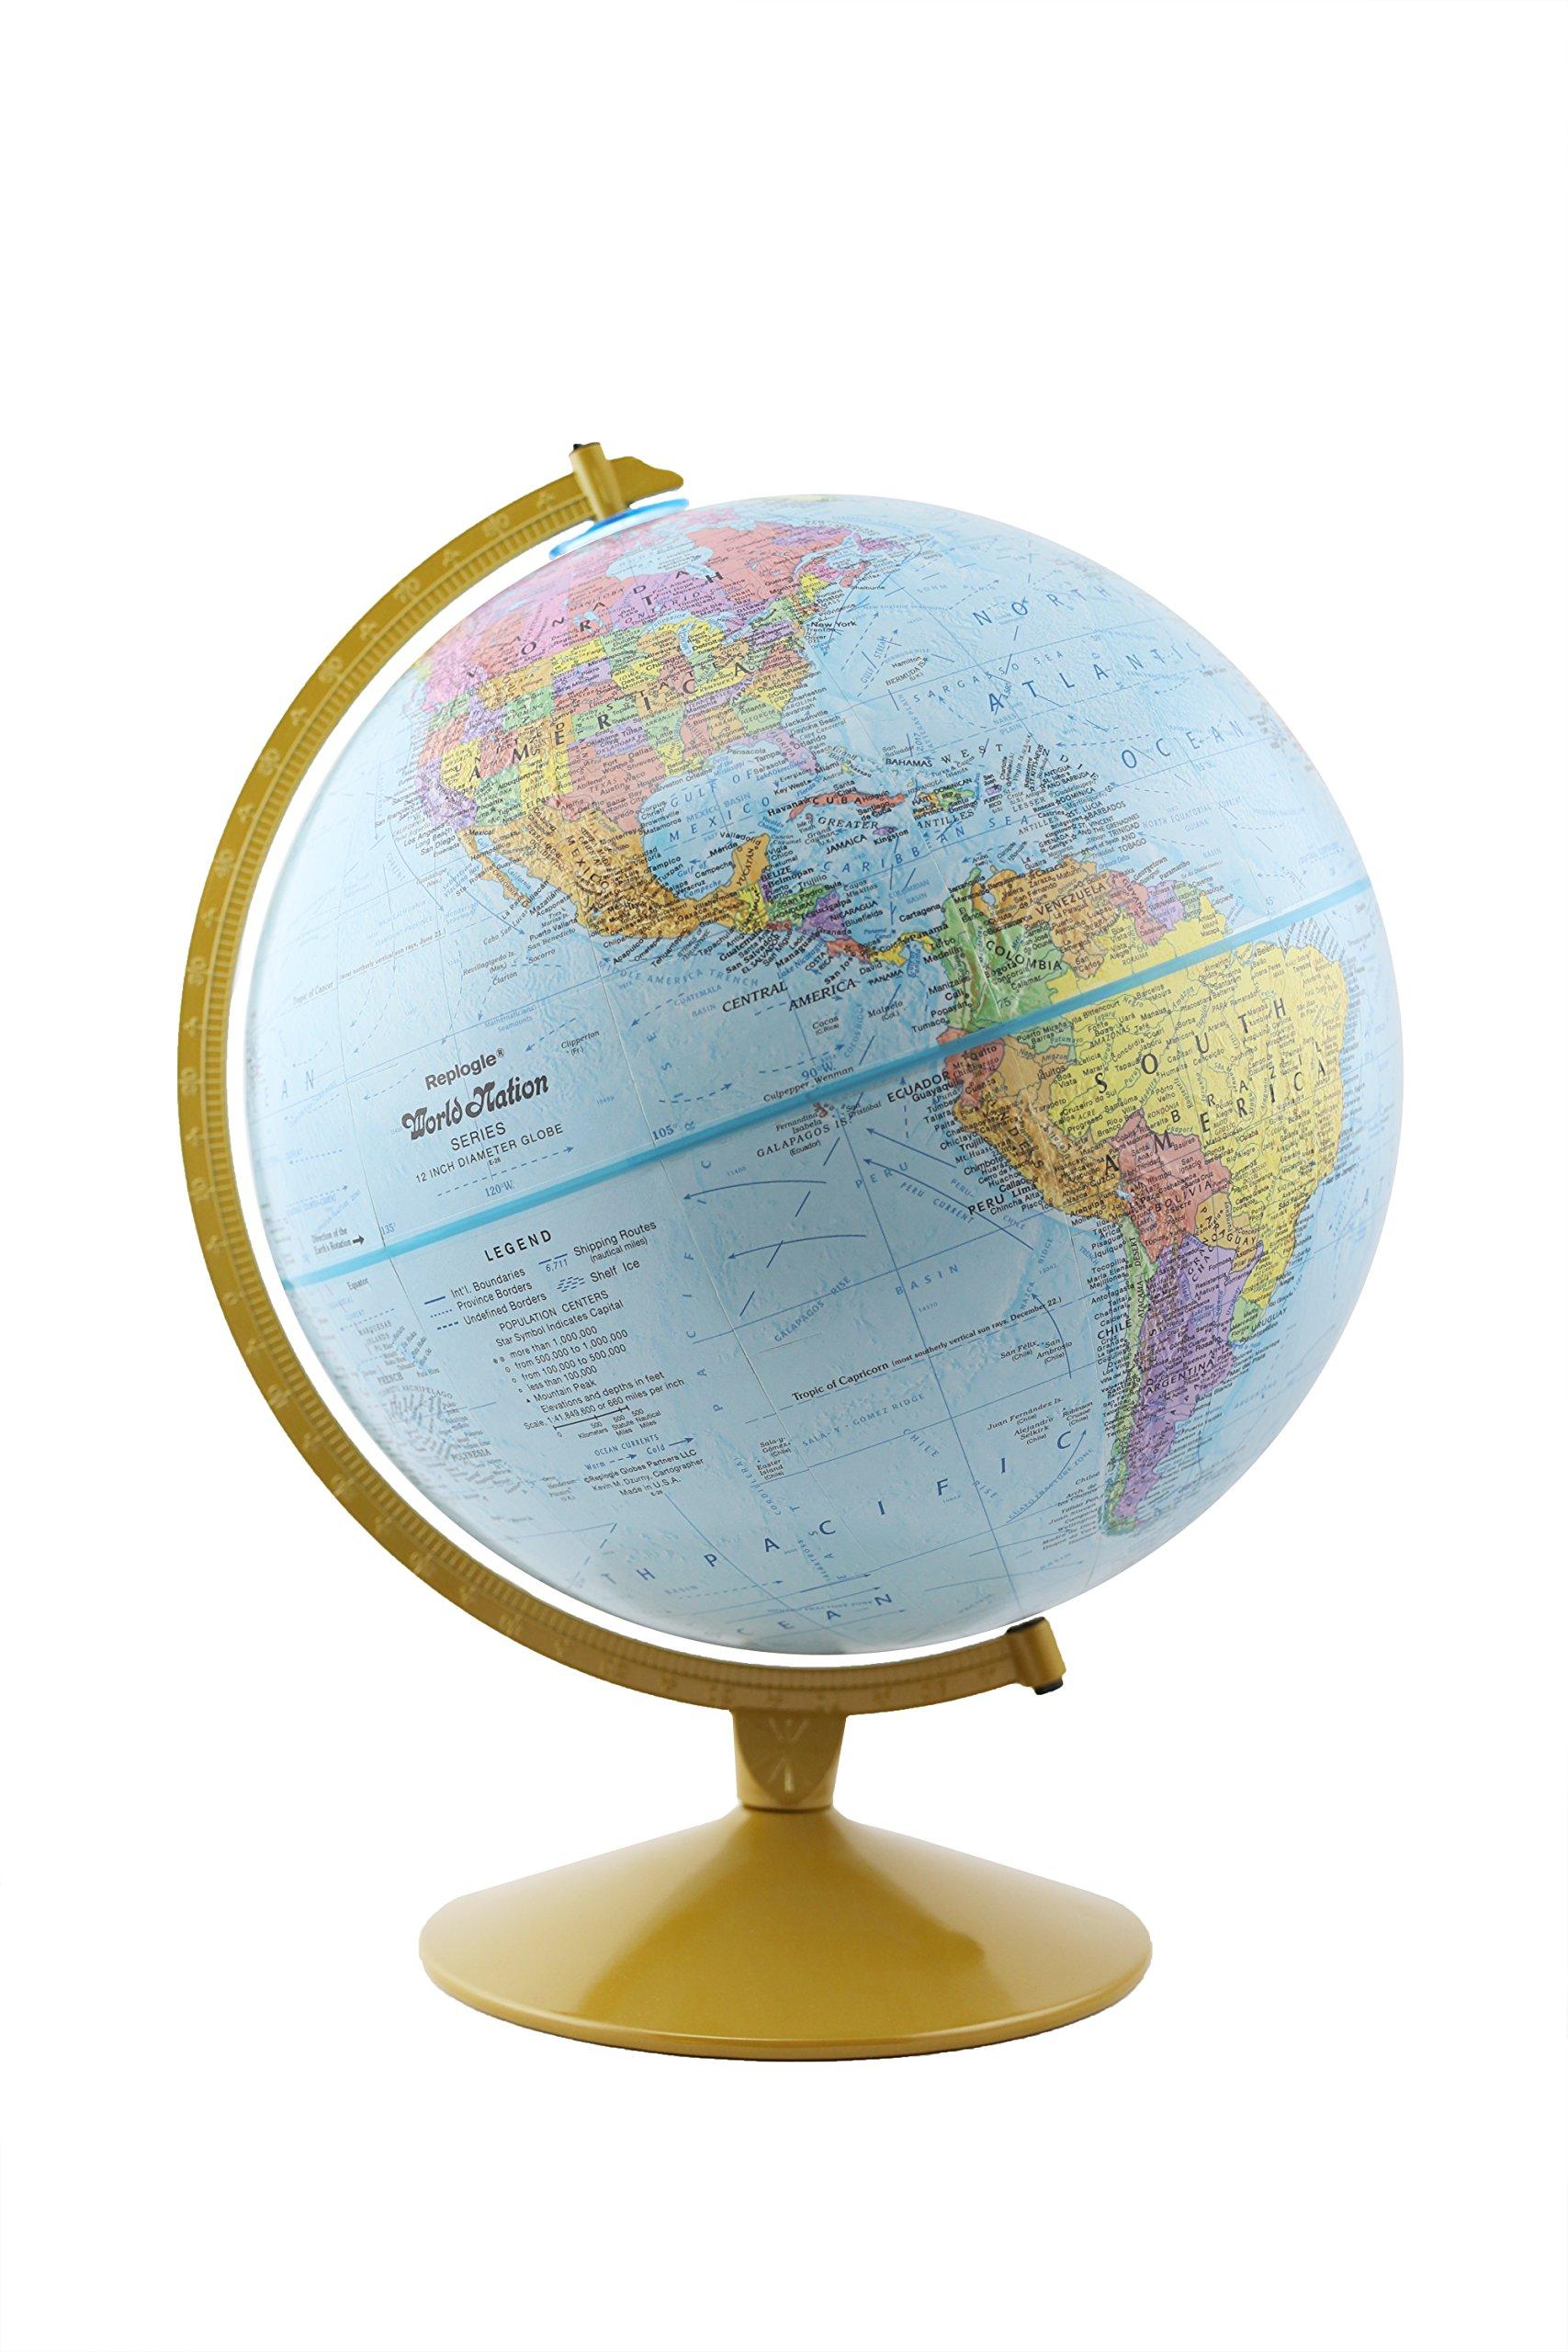 Replogle Globes Explorer Spanish Language Globe, 12-Inch Diameter by Replogle